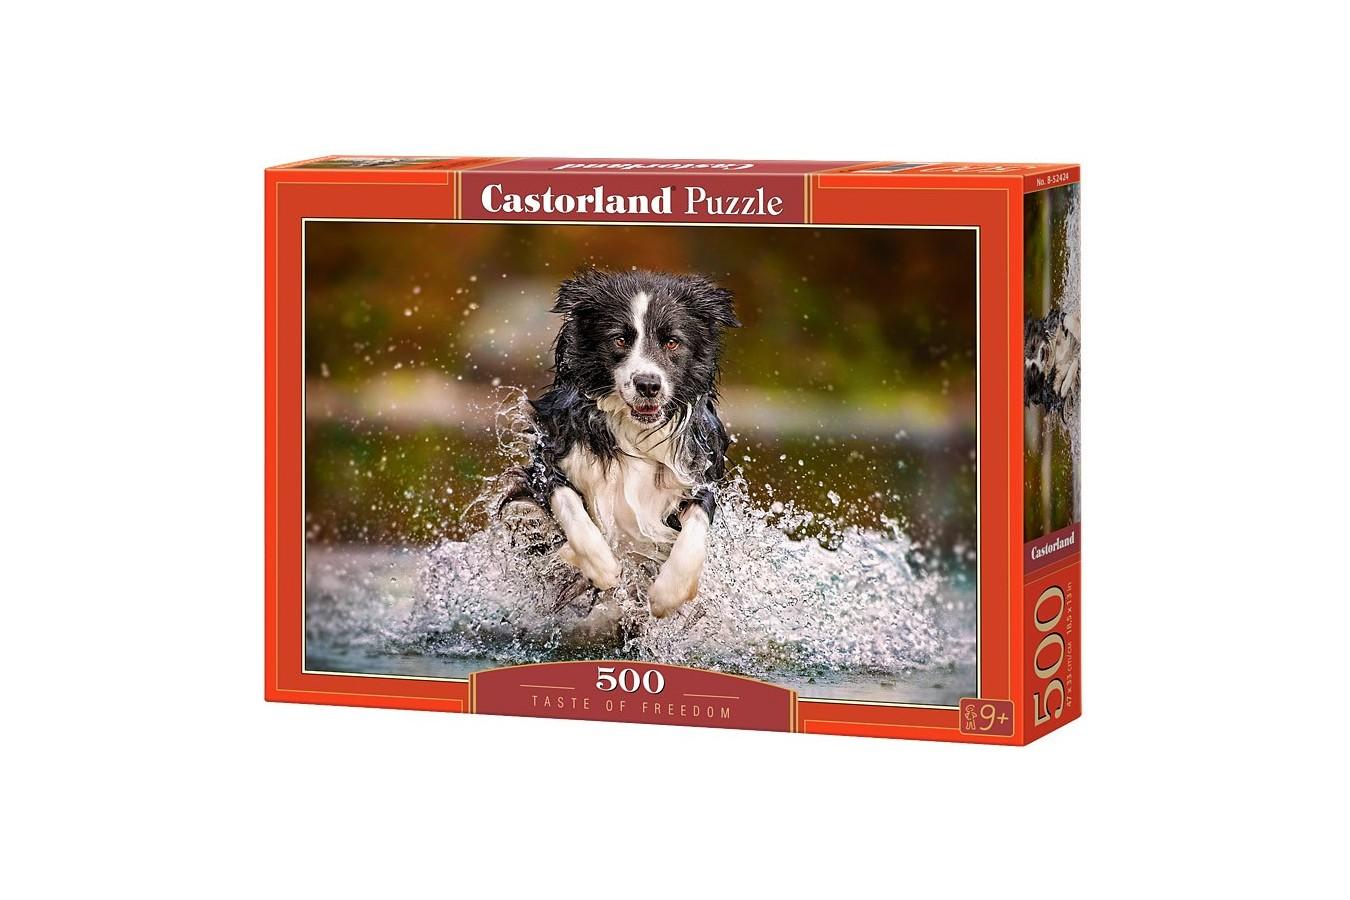 Puzzle Castorland - Taste of Freedom, 500 piese